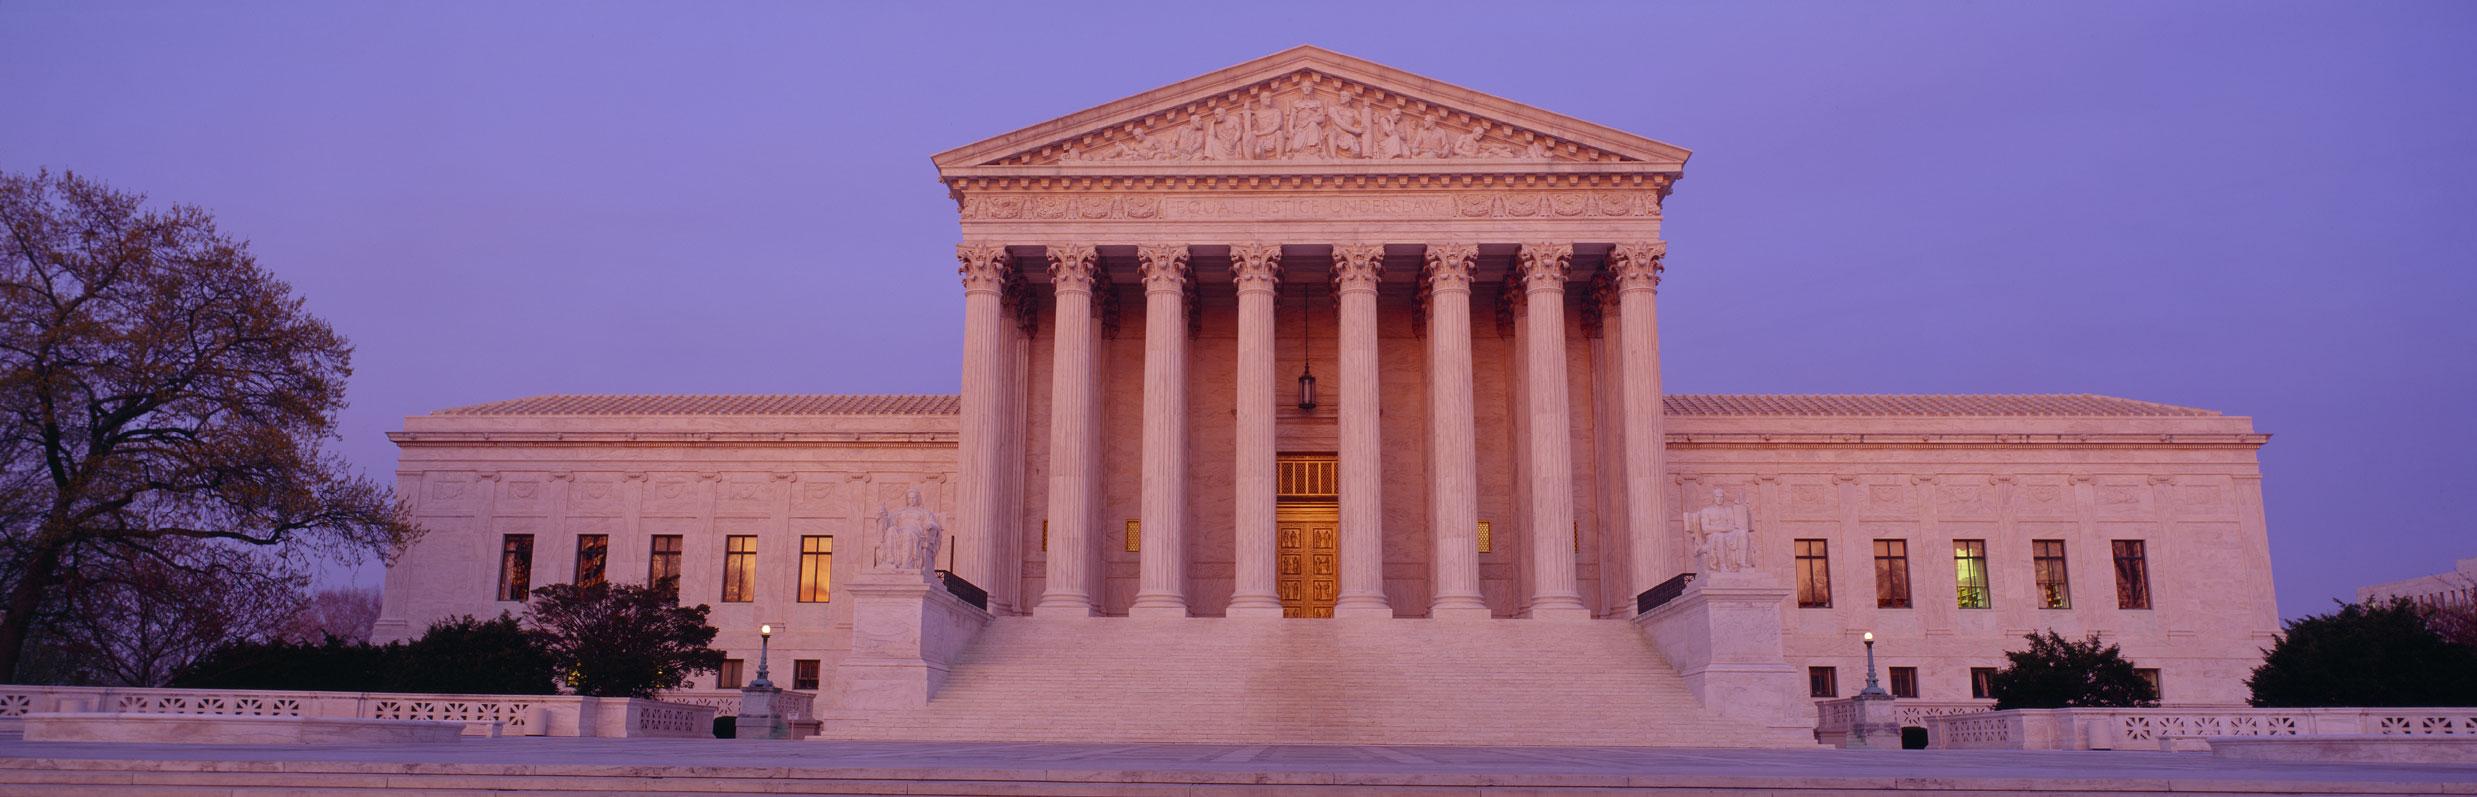 us-supreme-court-72-shutterstock_102209974